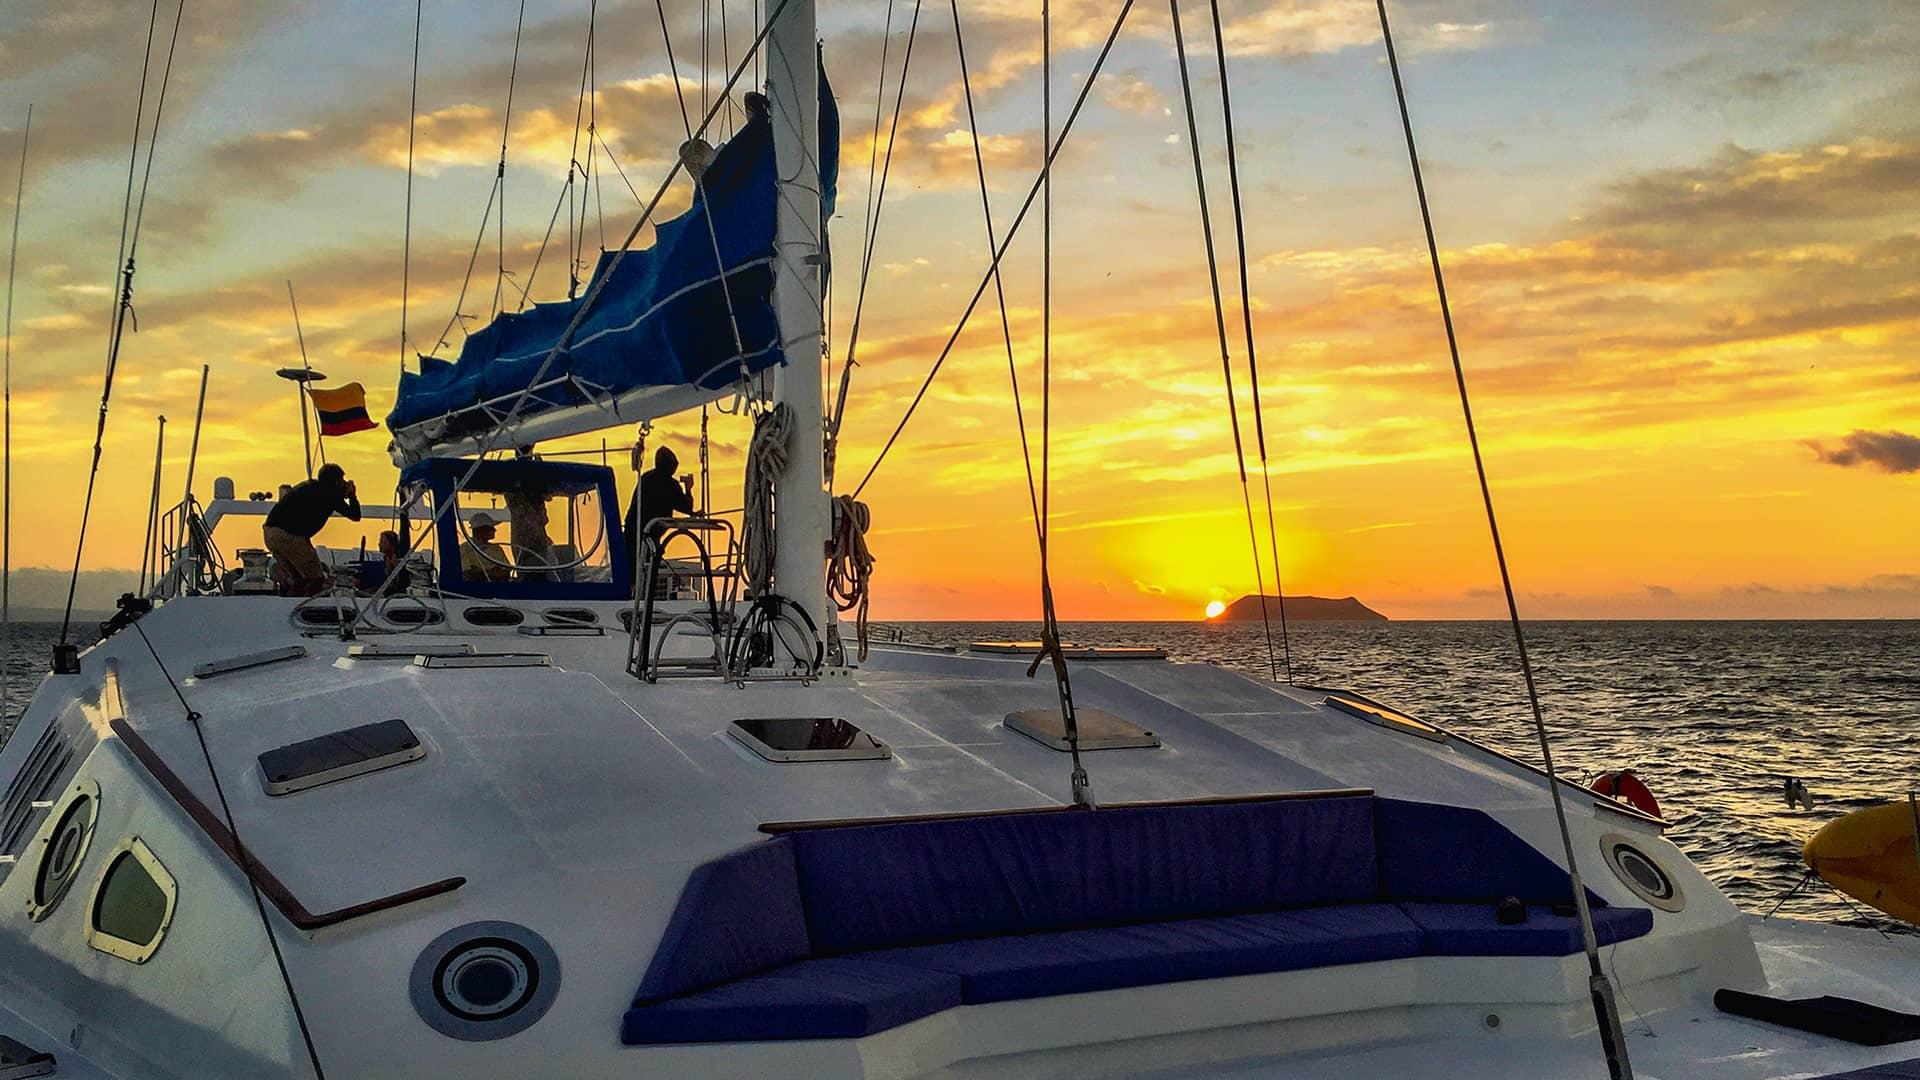 Galapagos Christmas 2020 Explore Galapagos Islands | Aboard Nemo Fleet